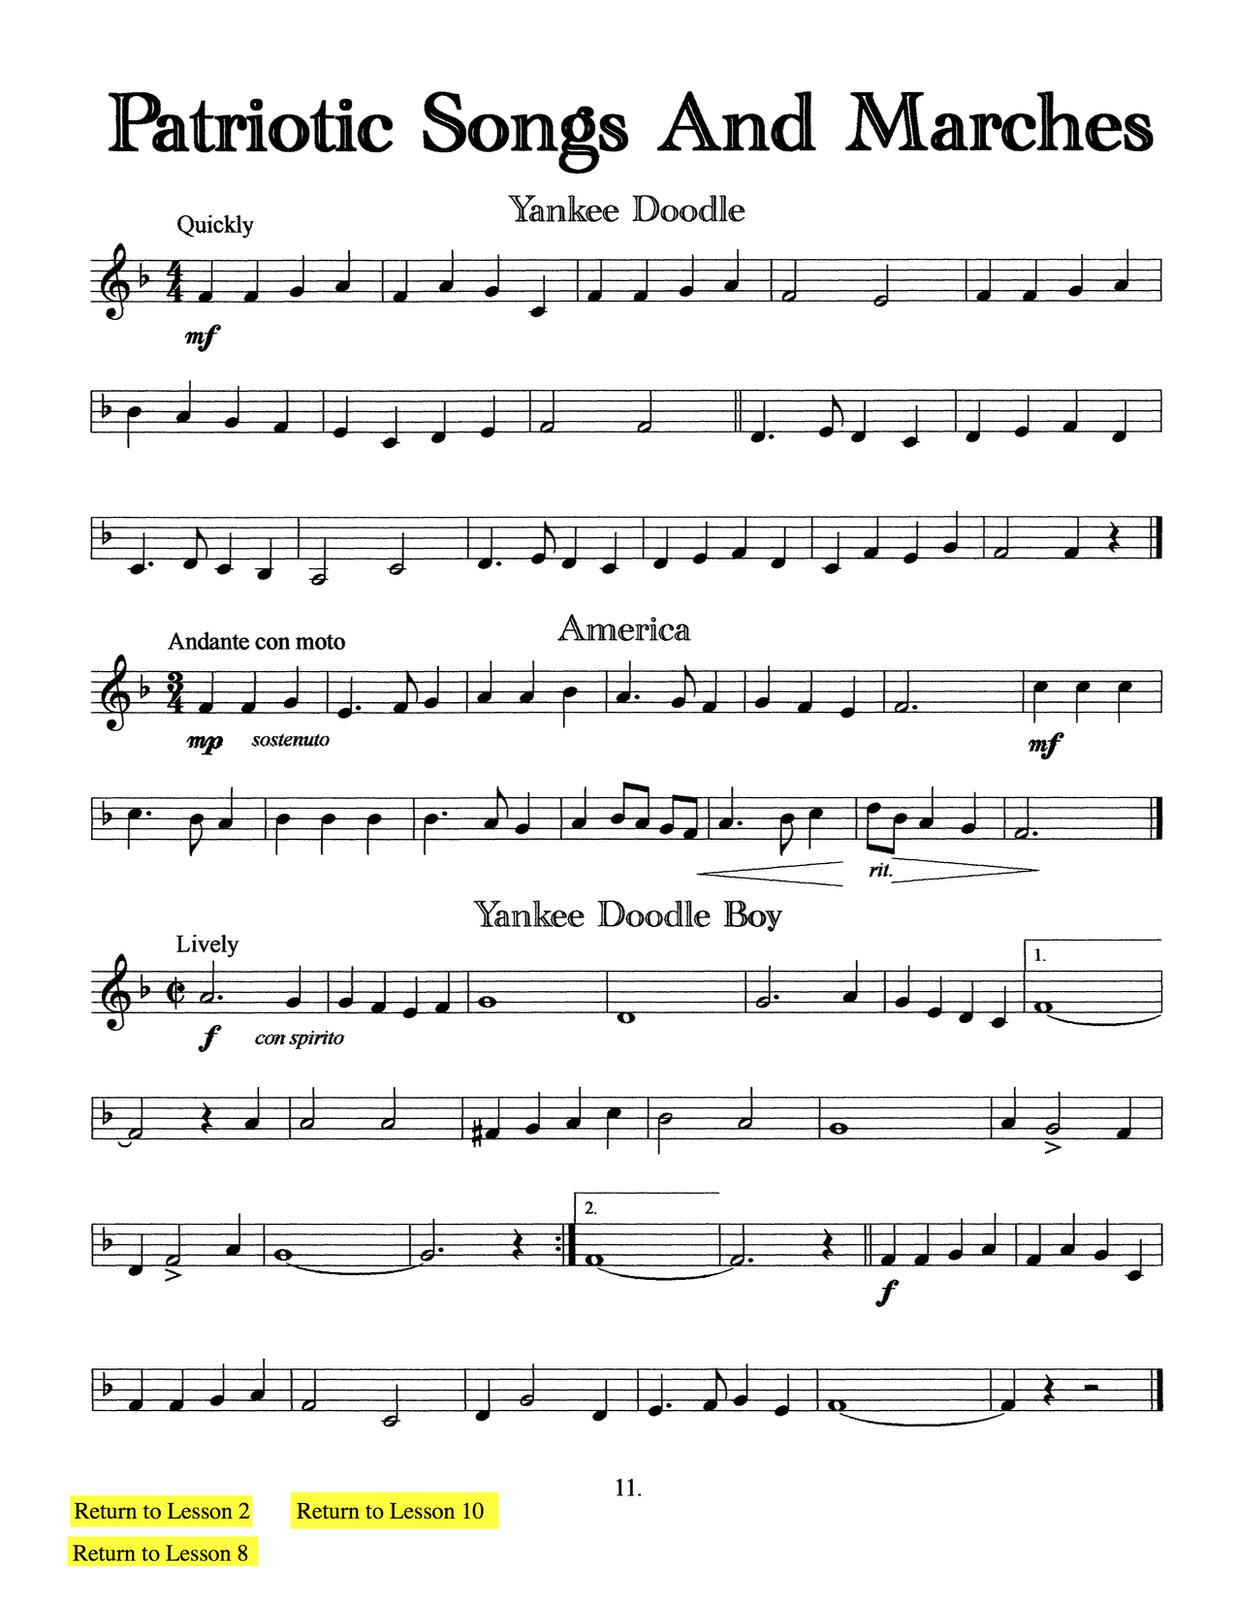 I Play Trumpet by Bolvin, Eric | qPress